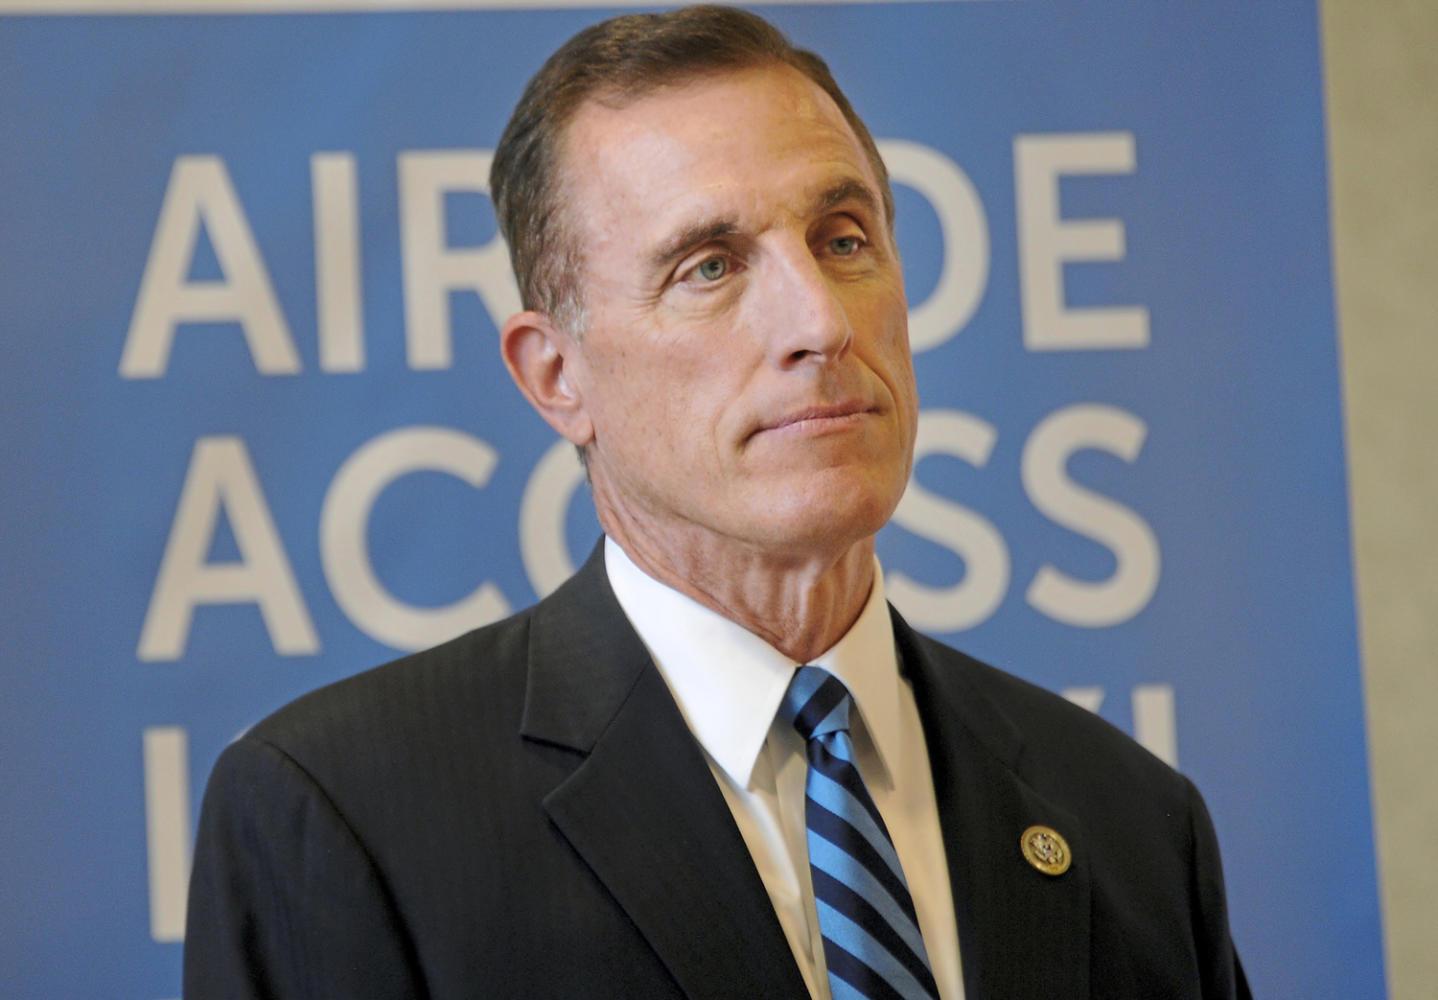 U.S. Congressman Tim Murphy in August 2017. (Nate Guidry/Pittsburgh Post-Gazette/TNS)